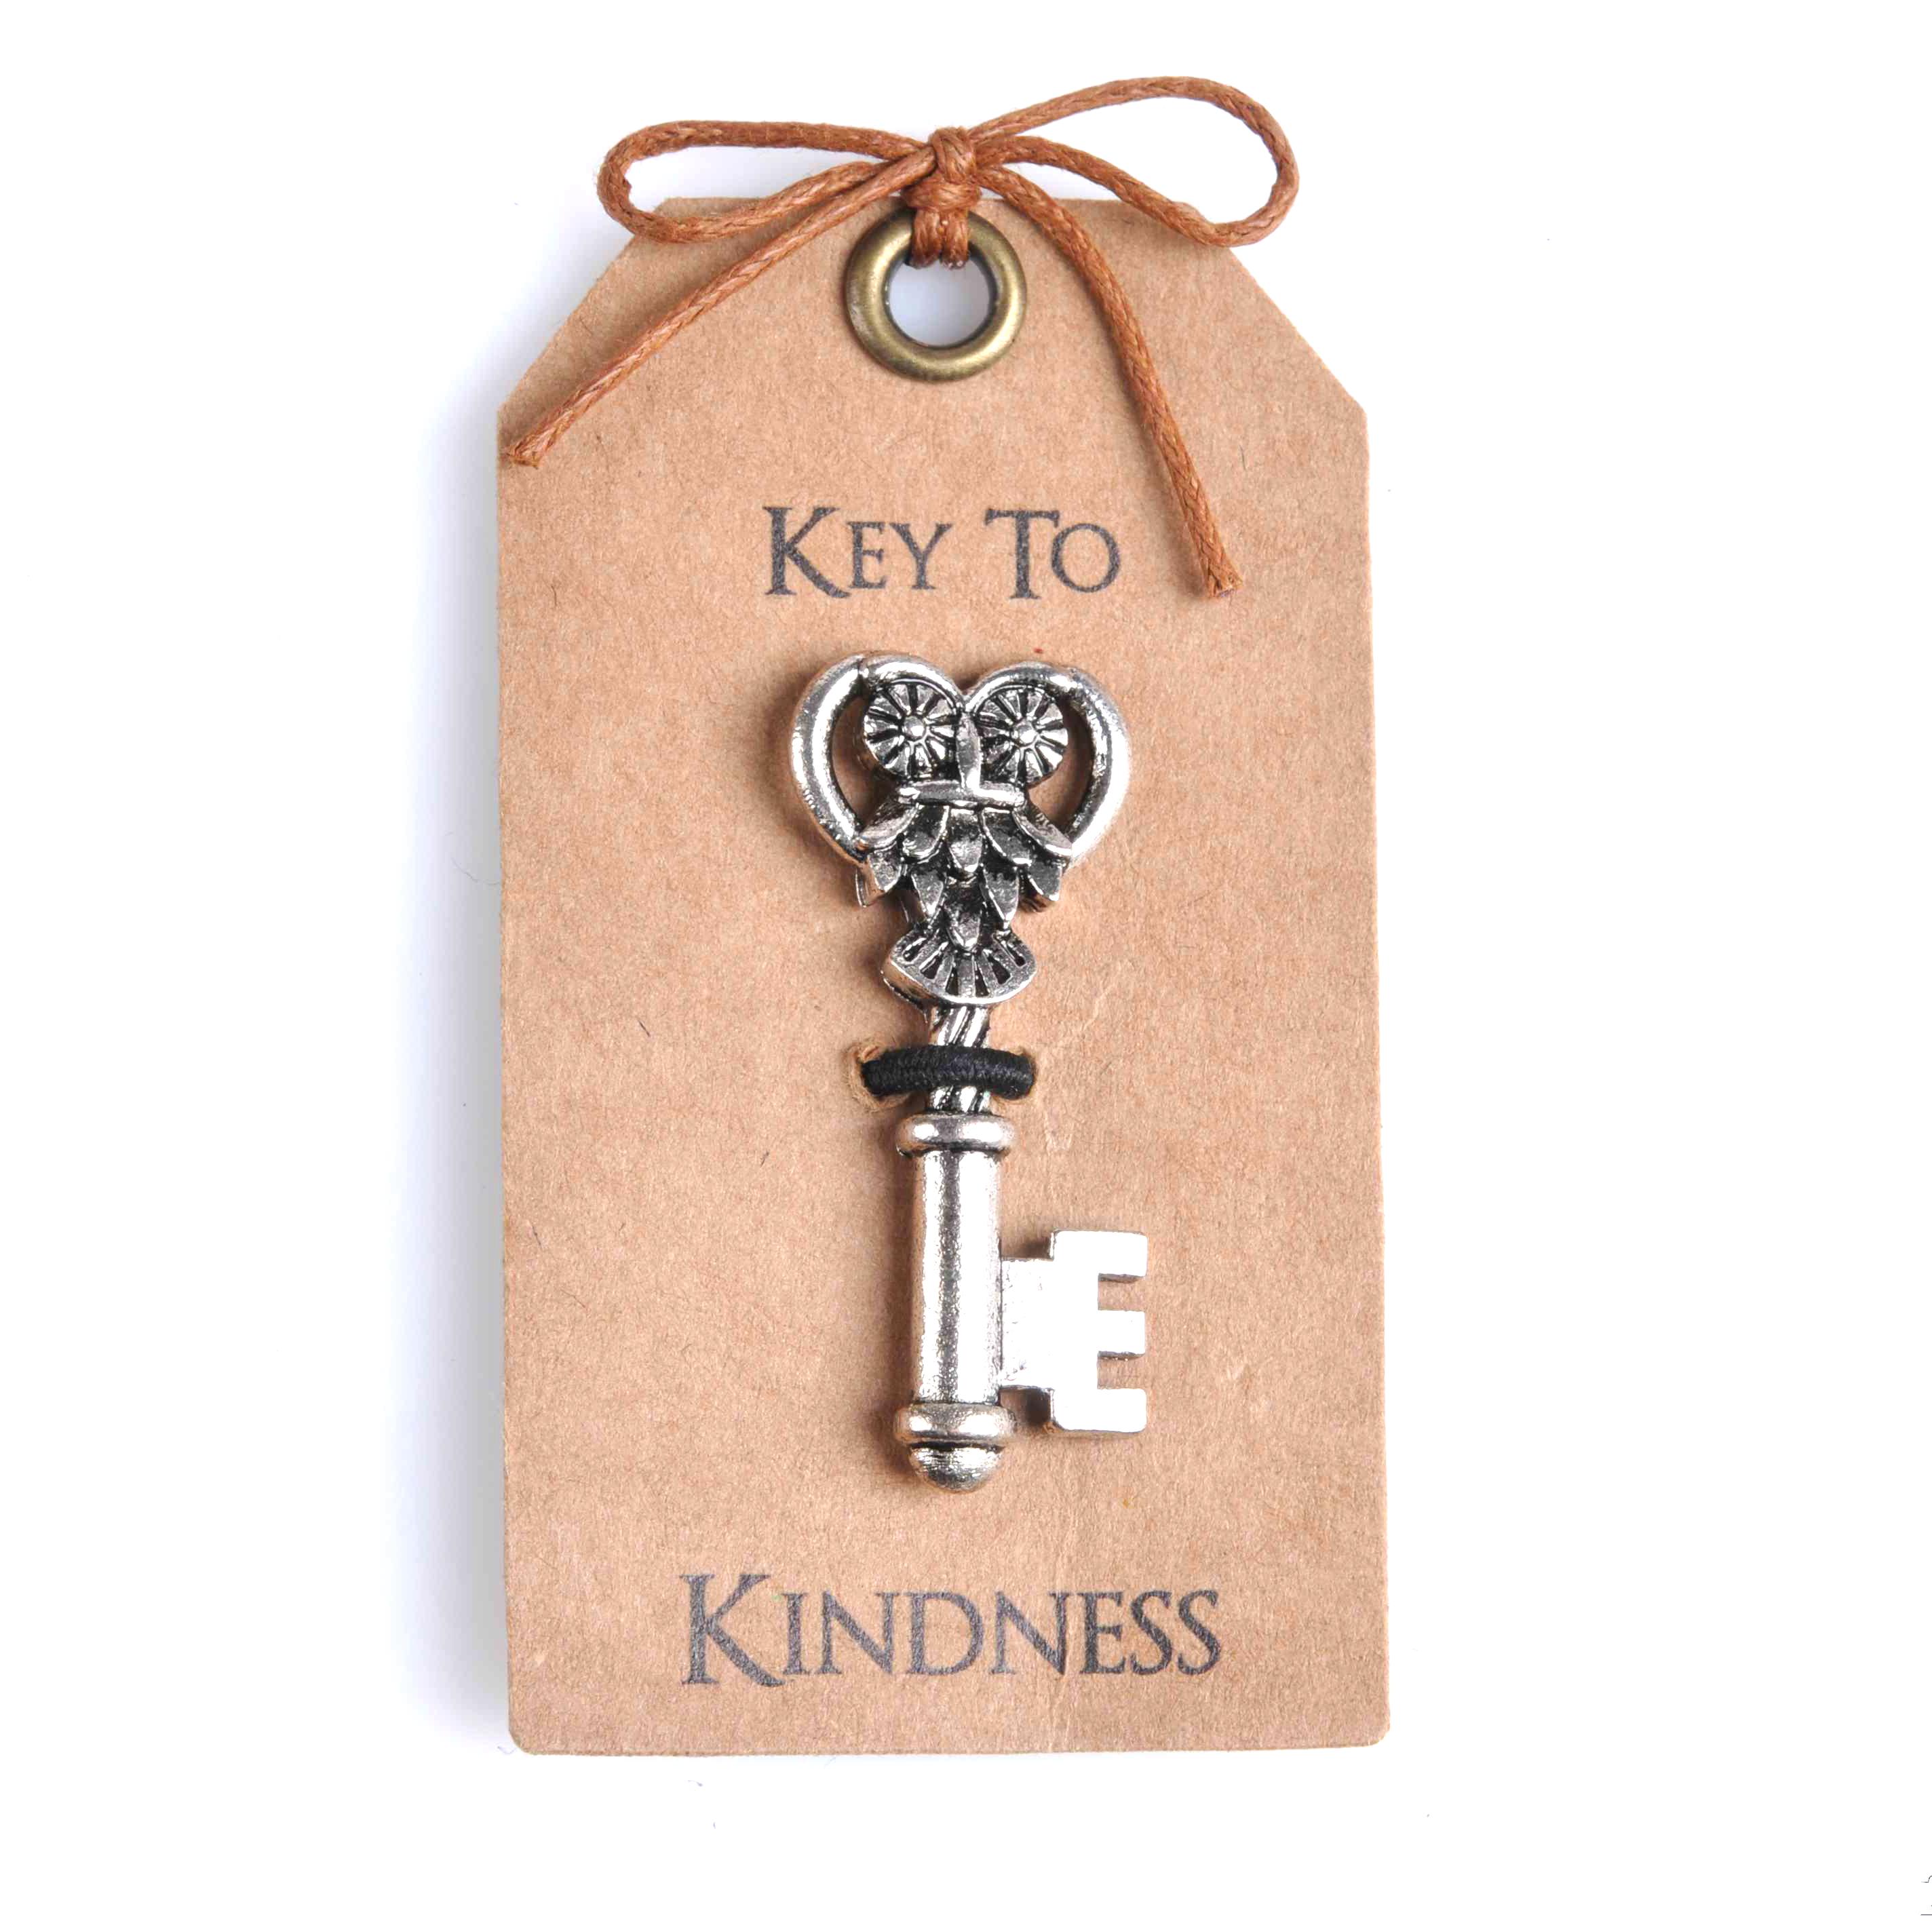 FATK-00096 Kindness